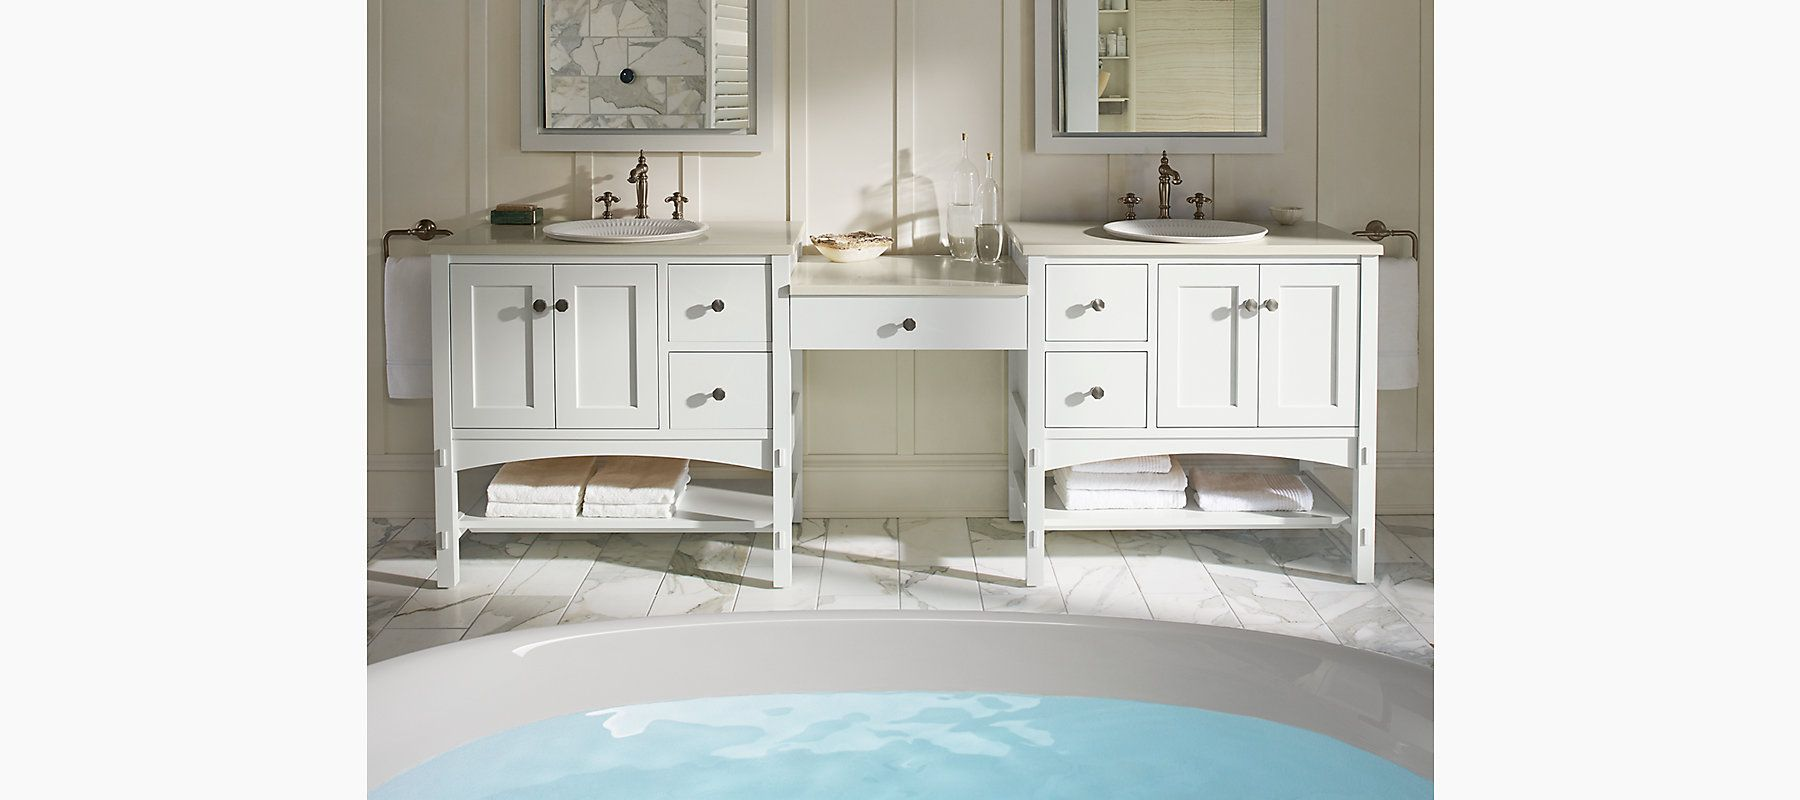 K 99007 Verdera Medicine Cabinet With Magnifying Mirror Kohler Bathroom Vanity Bathrooms Remodel Small Bathroom Vanities